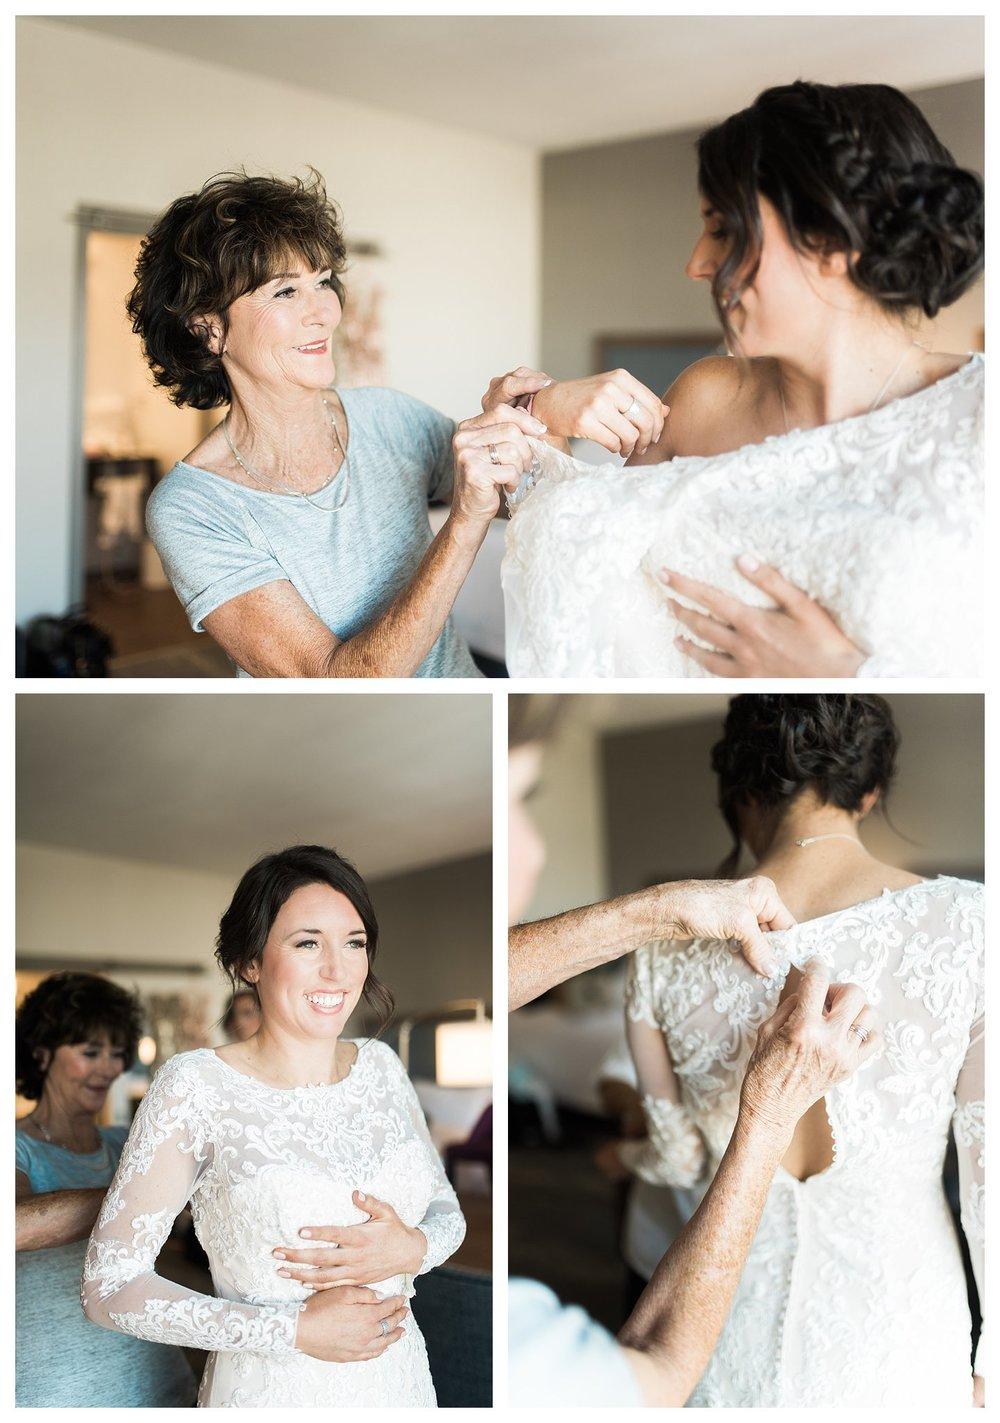 everleigh-photography-new-riff-distillery-cincinnati-wedding-photographer-northern-kentucky-wedding-photographer-jamie-and-dan-06